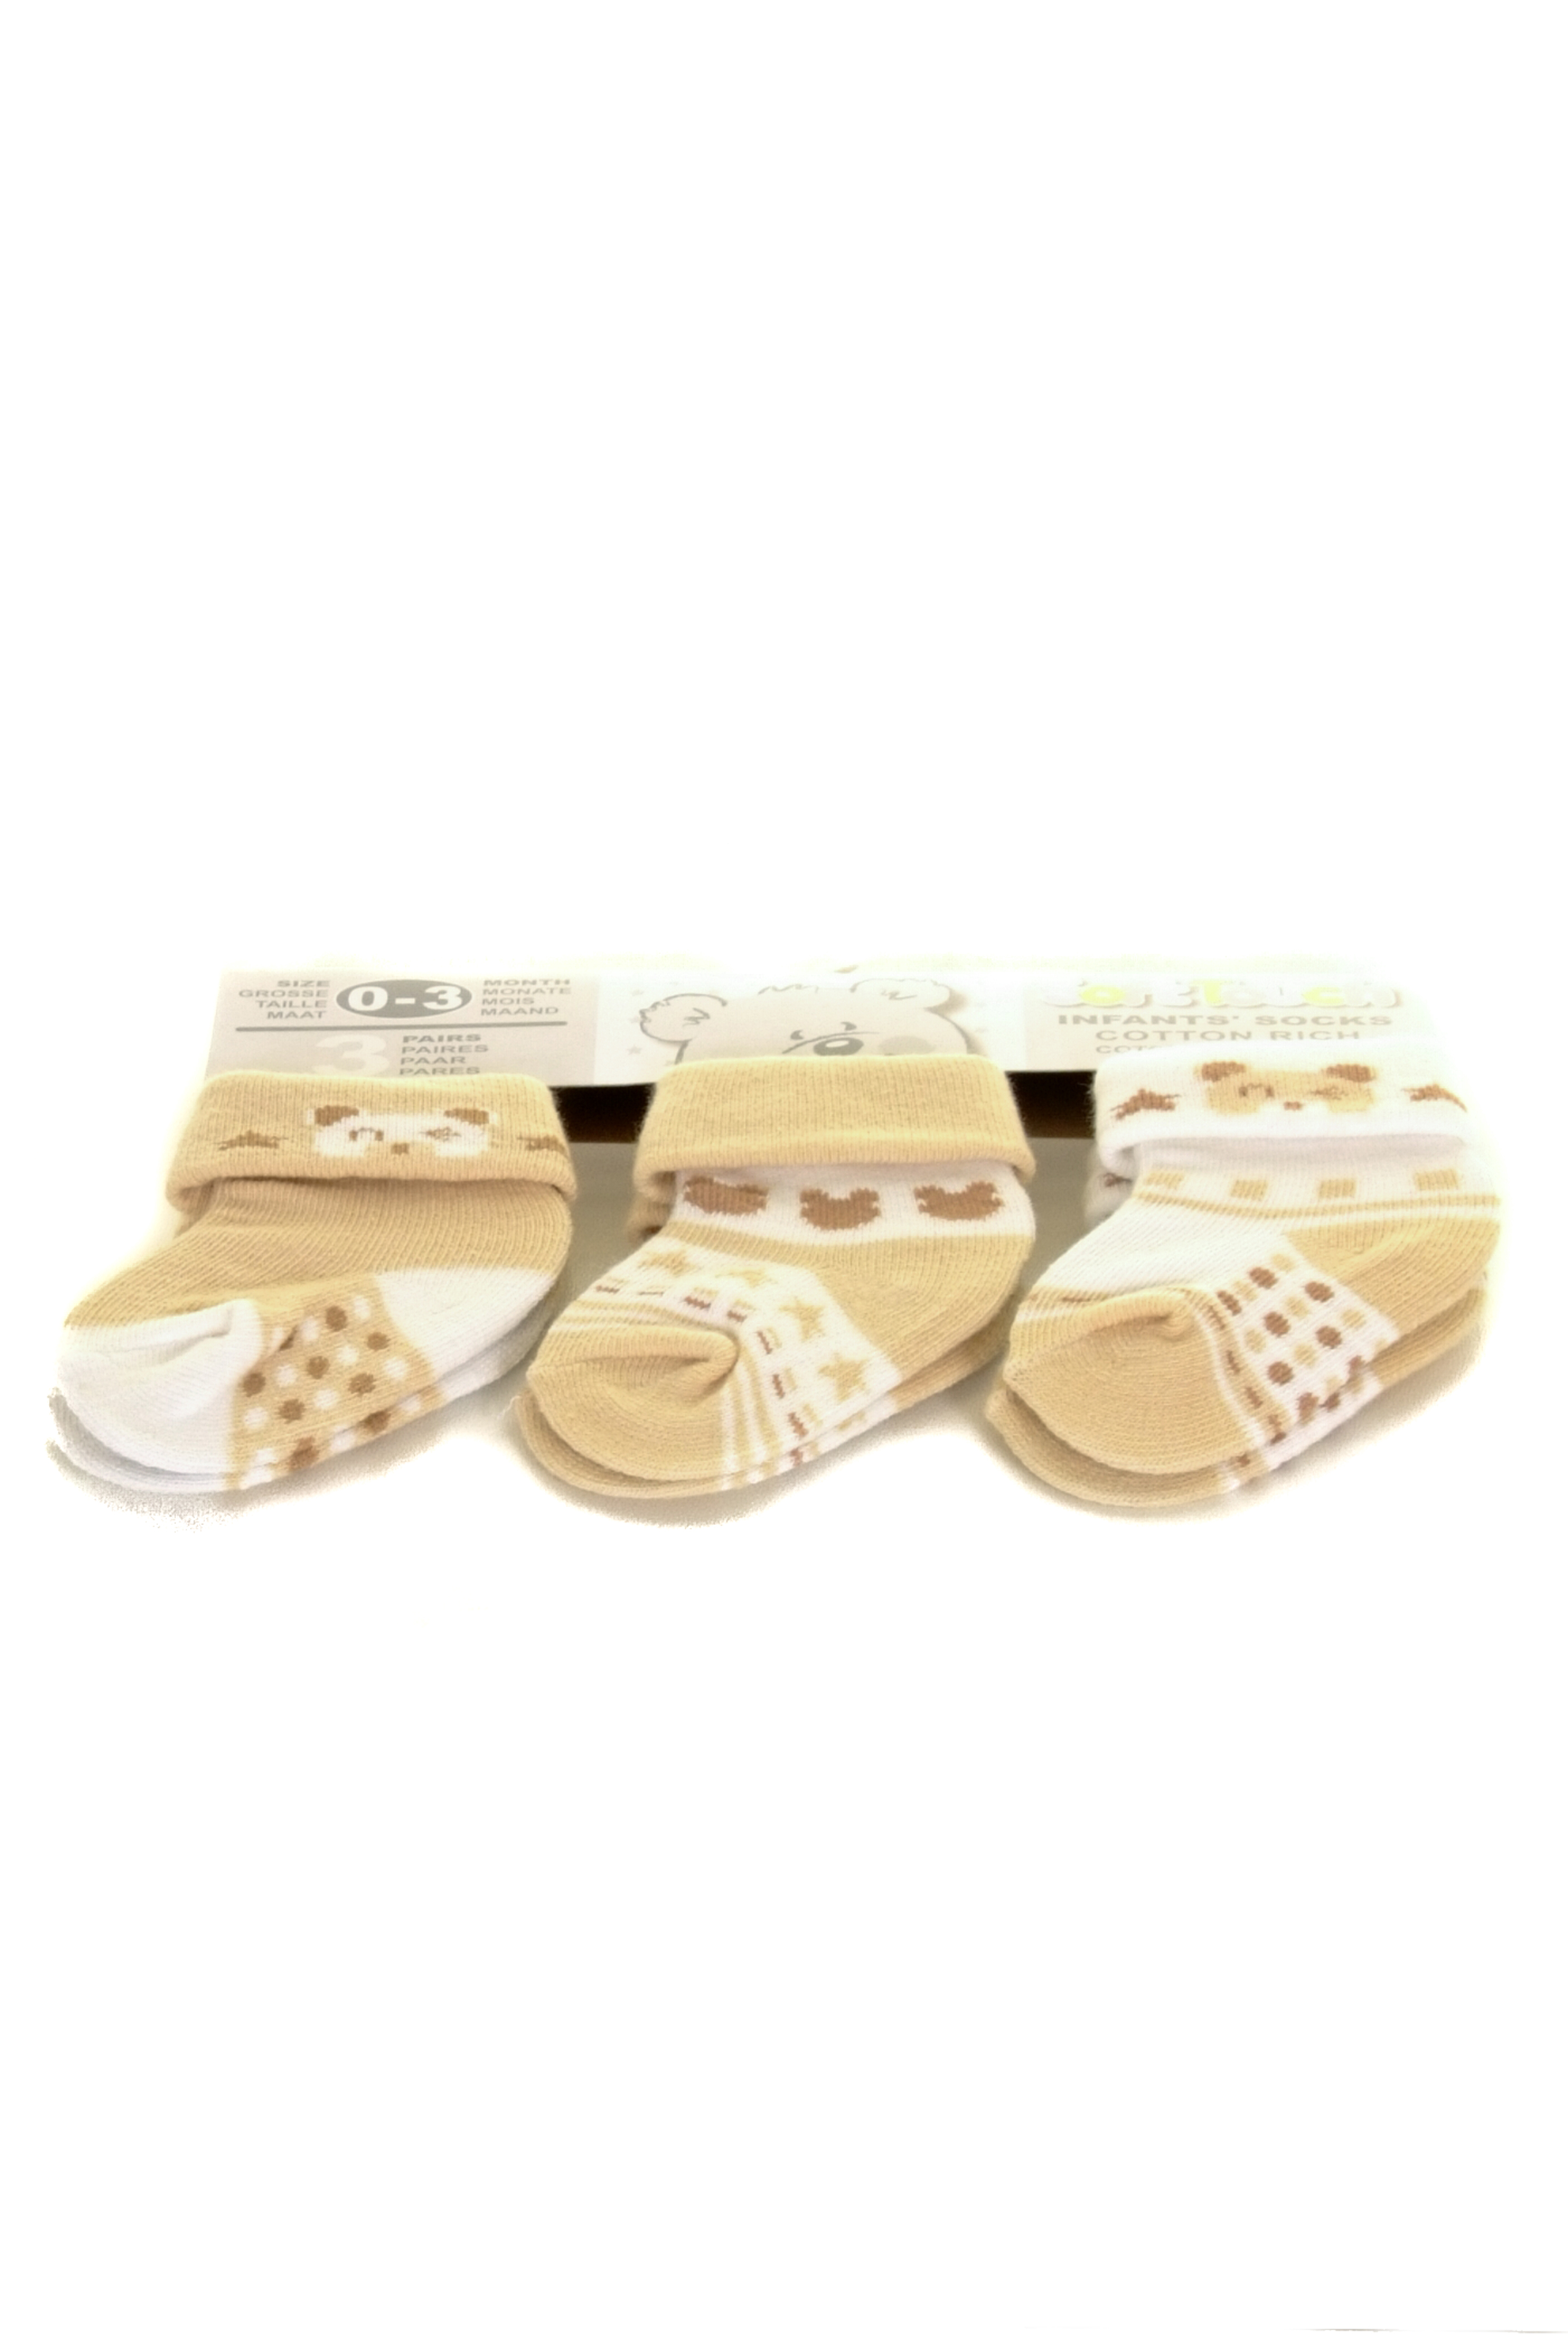 beige and white baby socks UK